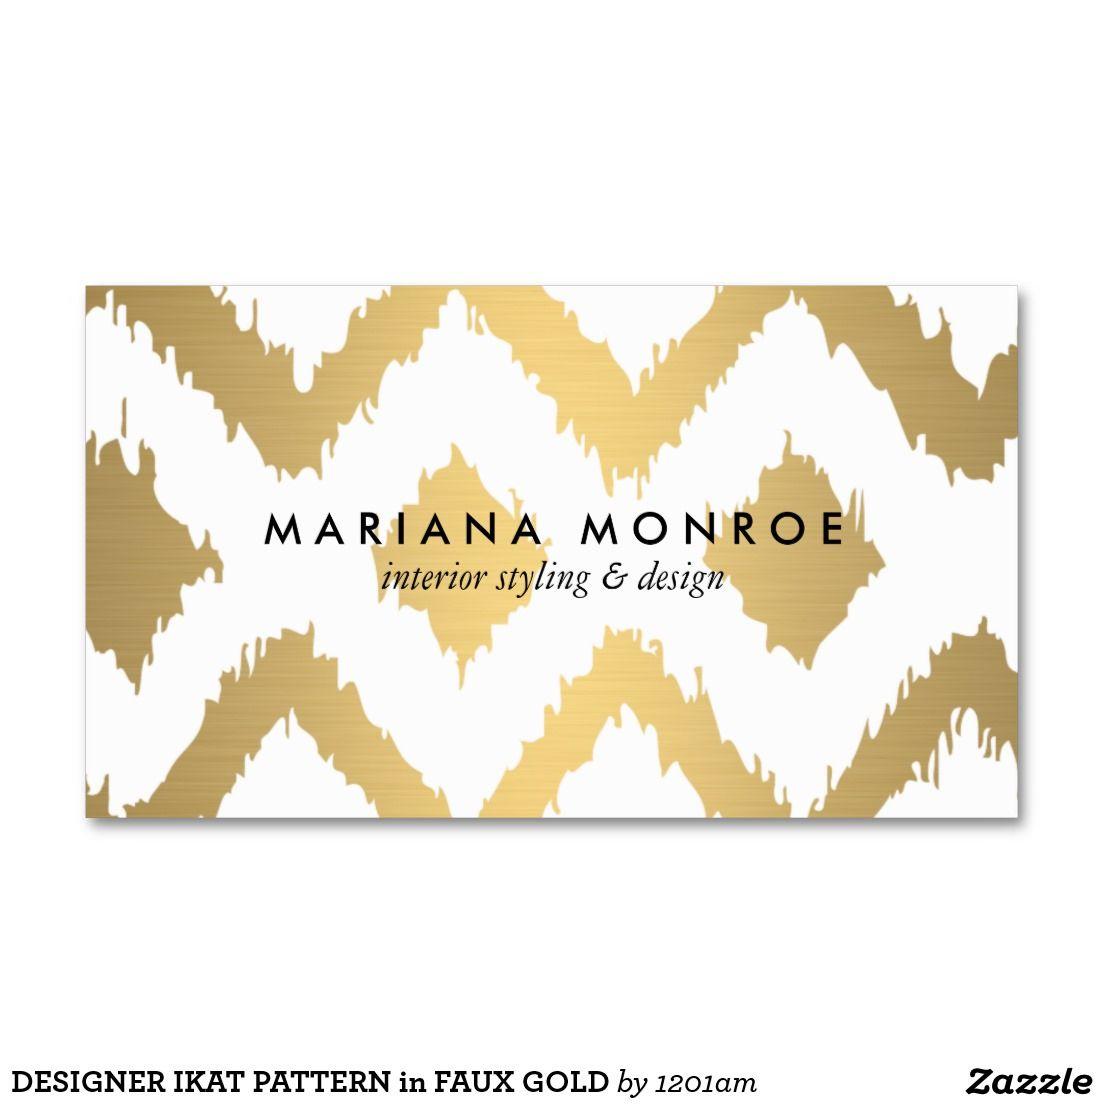 DESIGNER IKAT PATTERN in FAUX GOLD Business Card | Ikat pattern ...